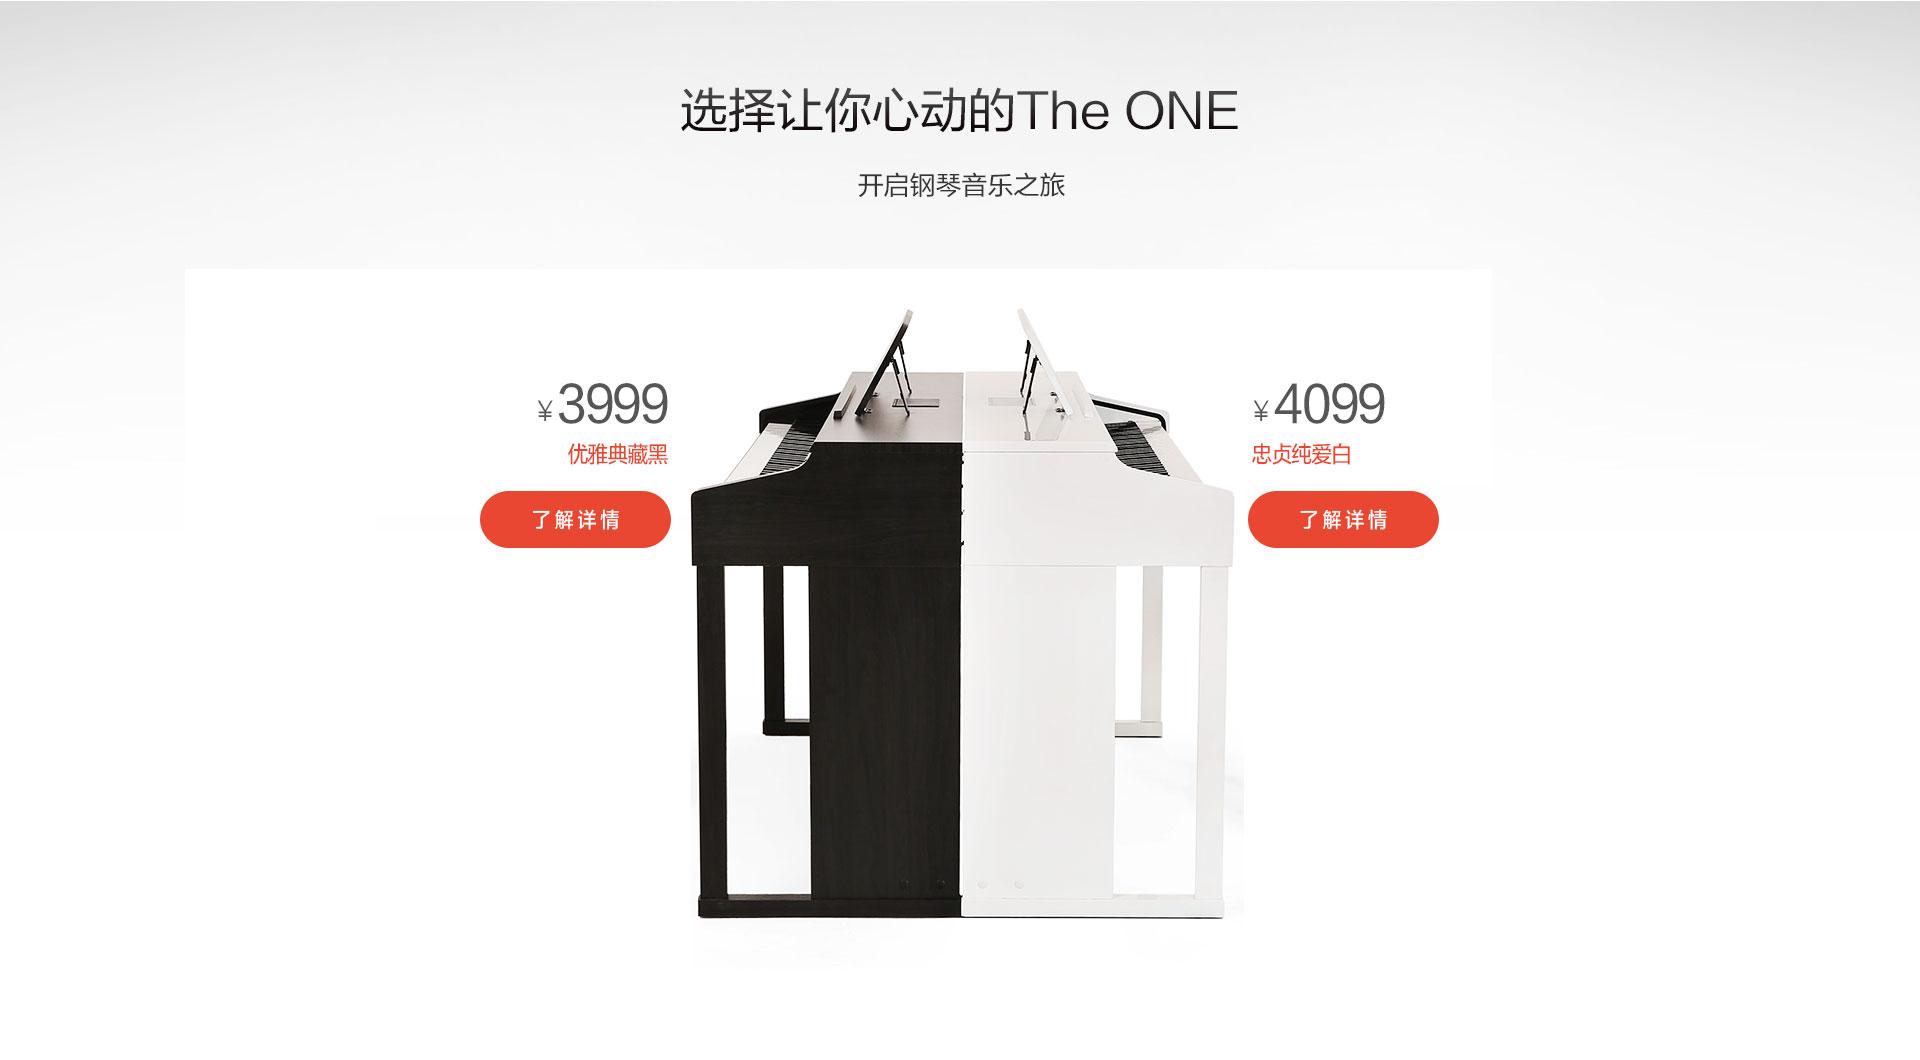 the one智能钢琴旗舰店